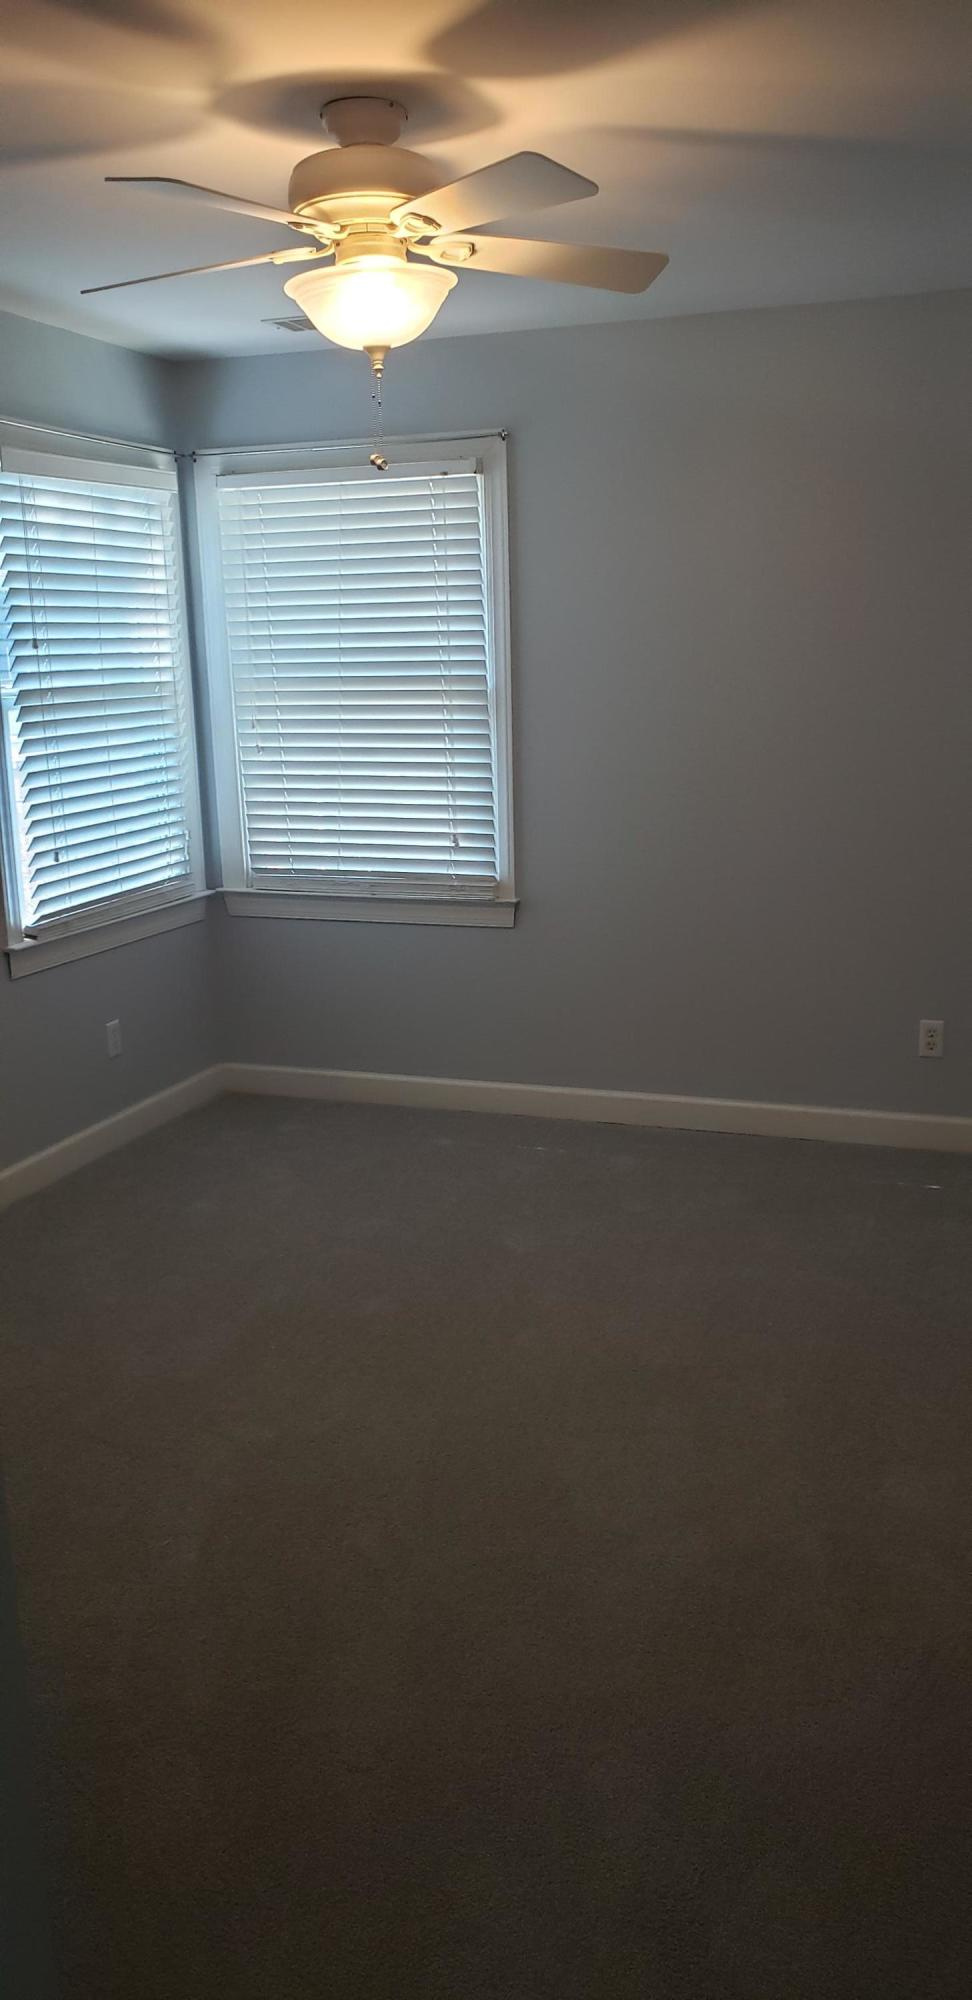 Laurel Lakes Homes For Sale - 1305 Woodlock, Mount Pleasant, SC - 26